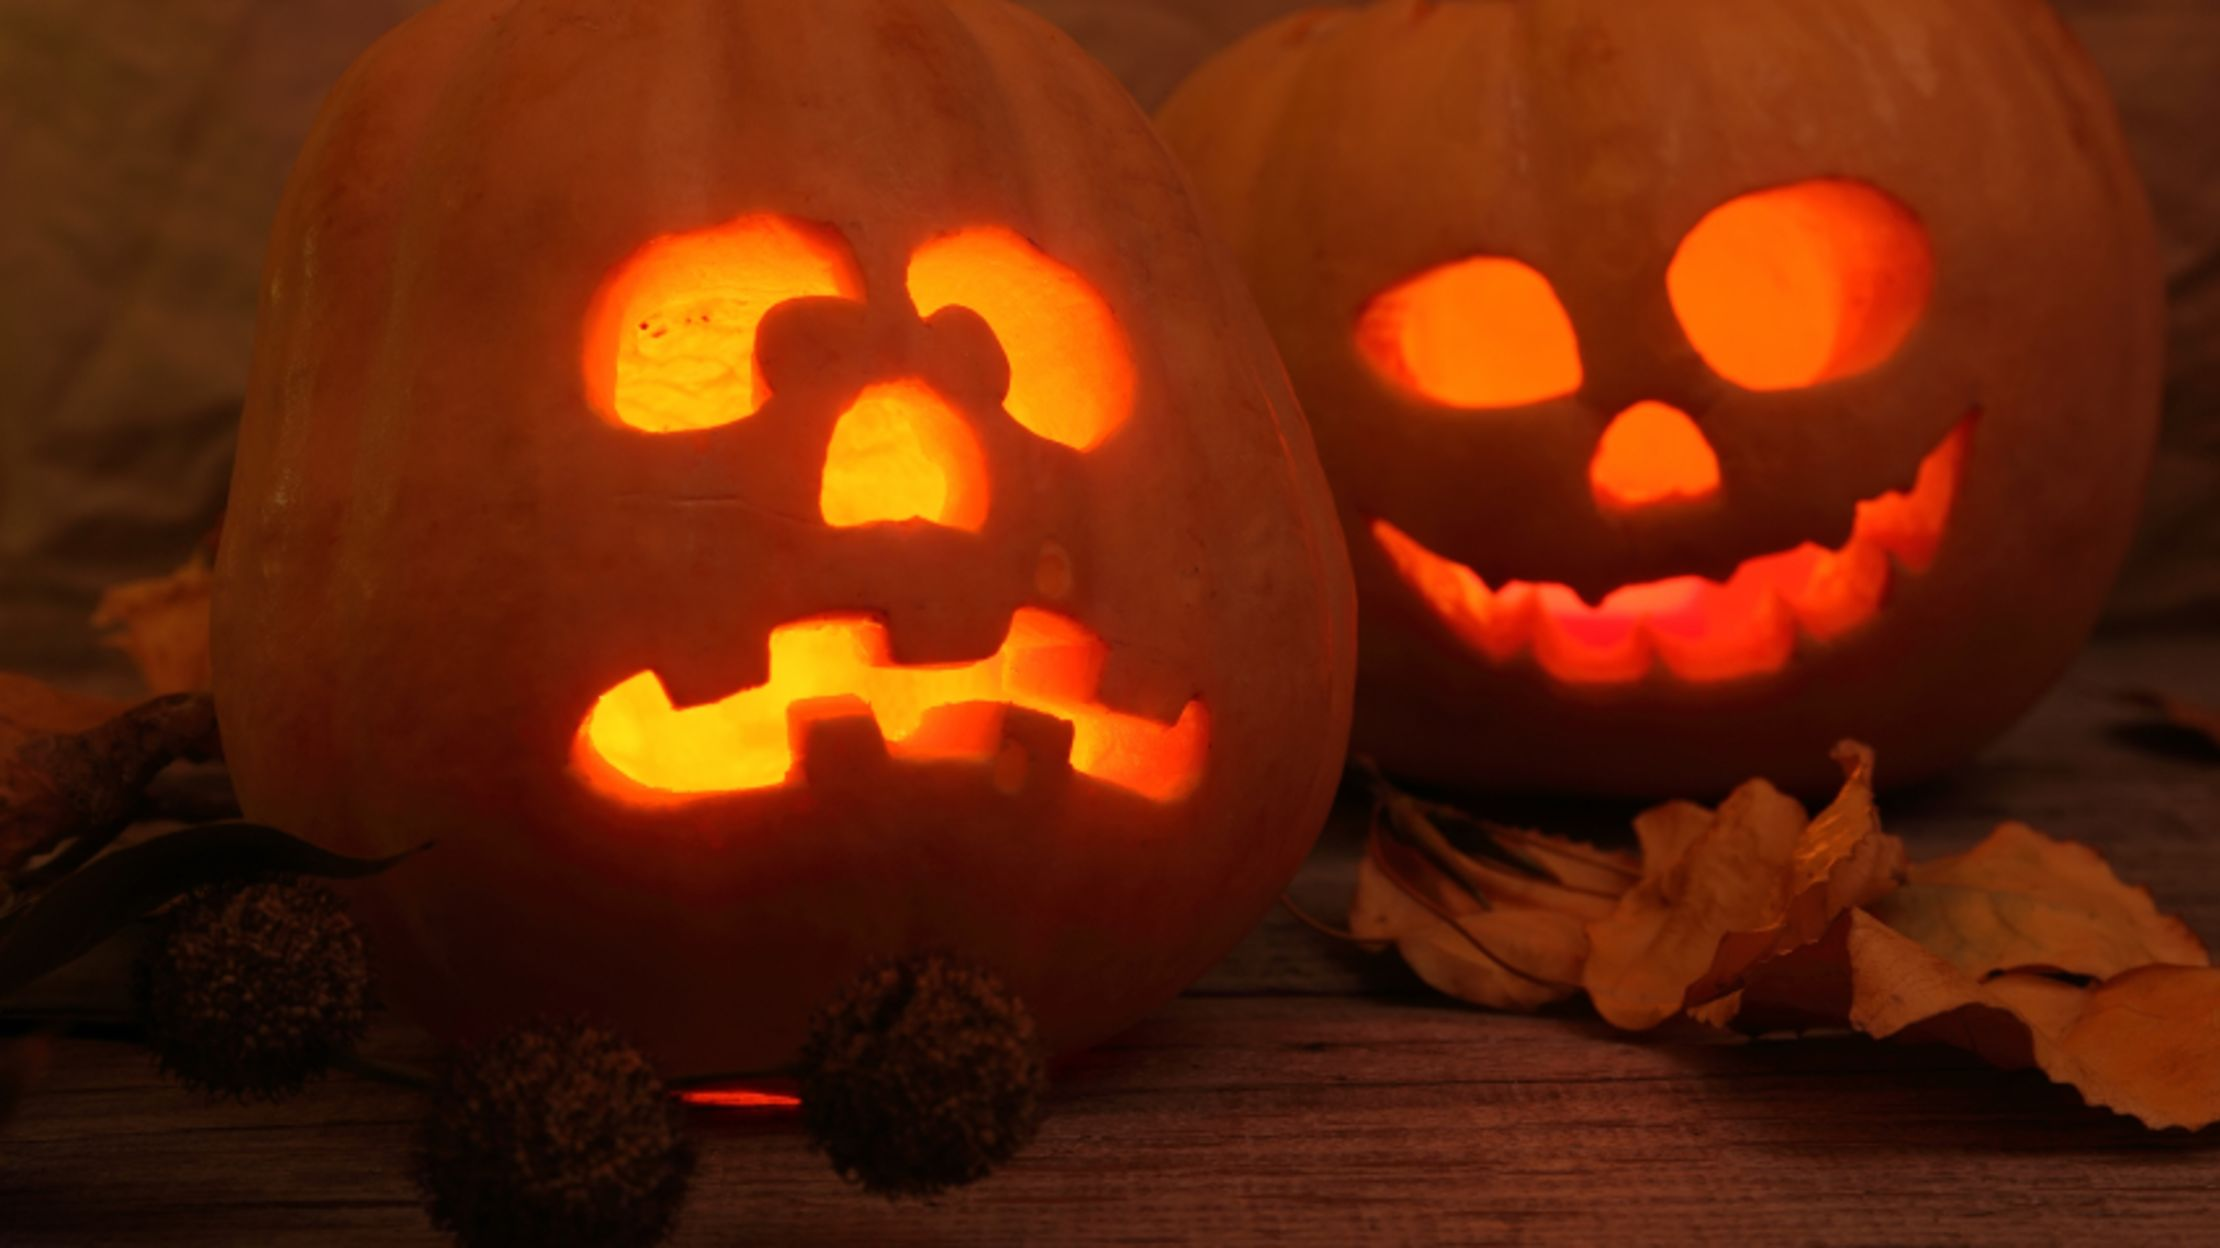 Why Do We Carve Pumpkins?